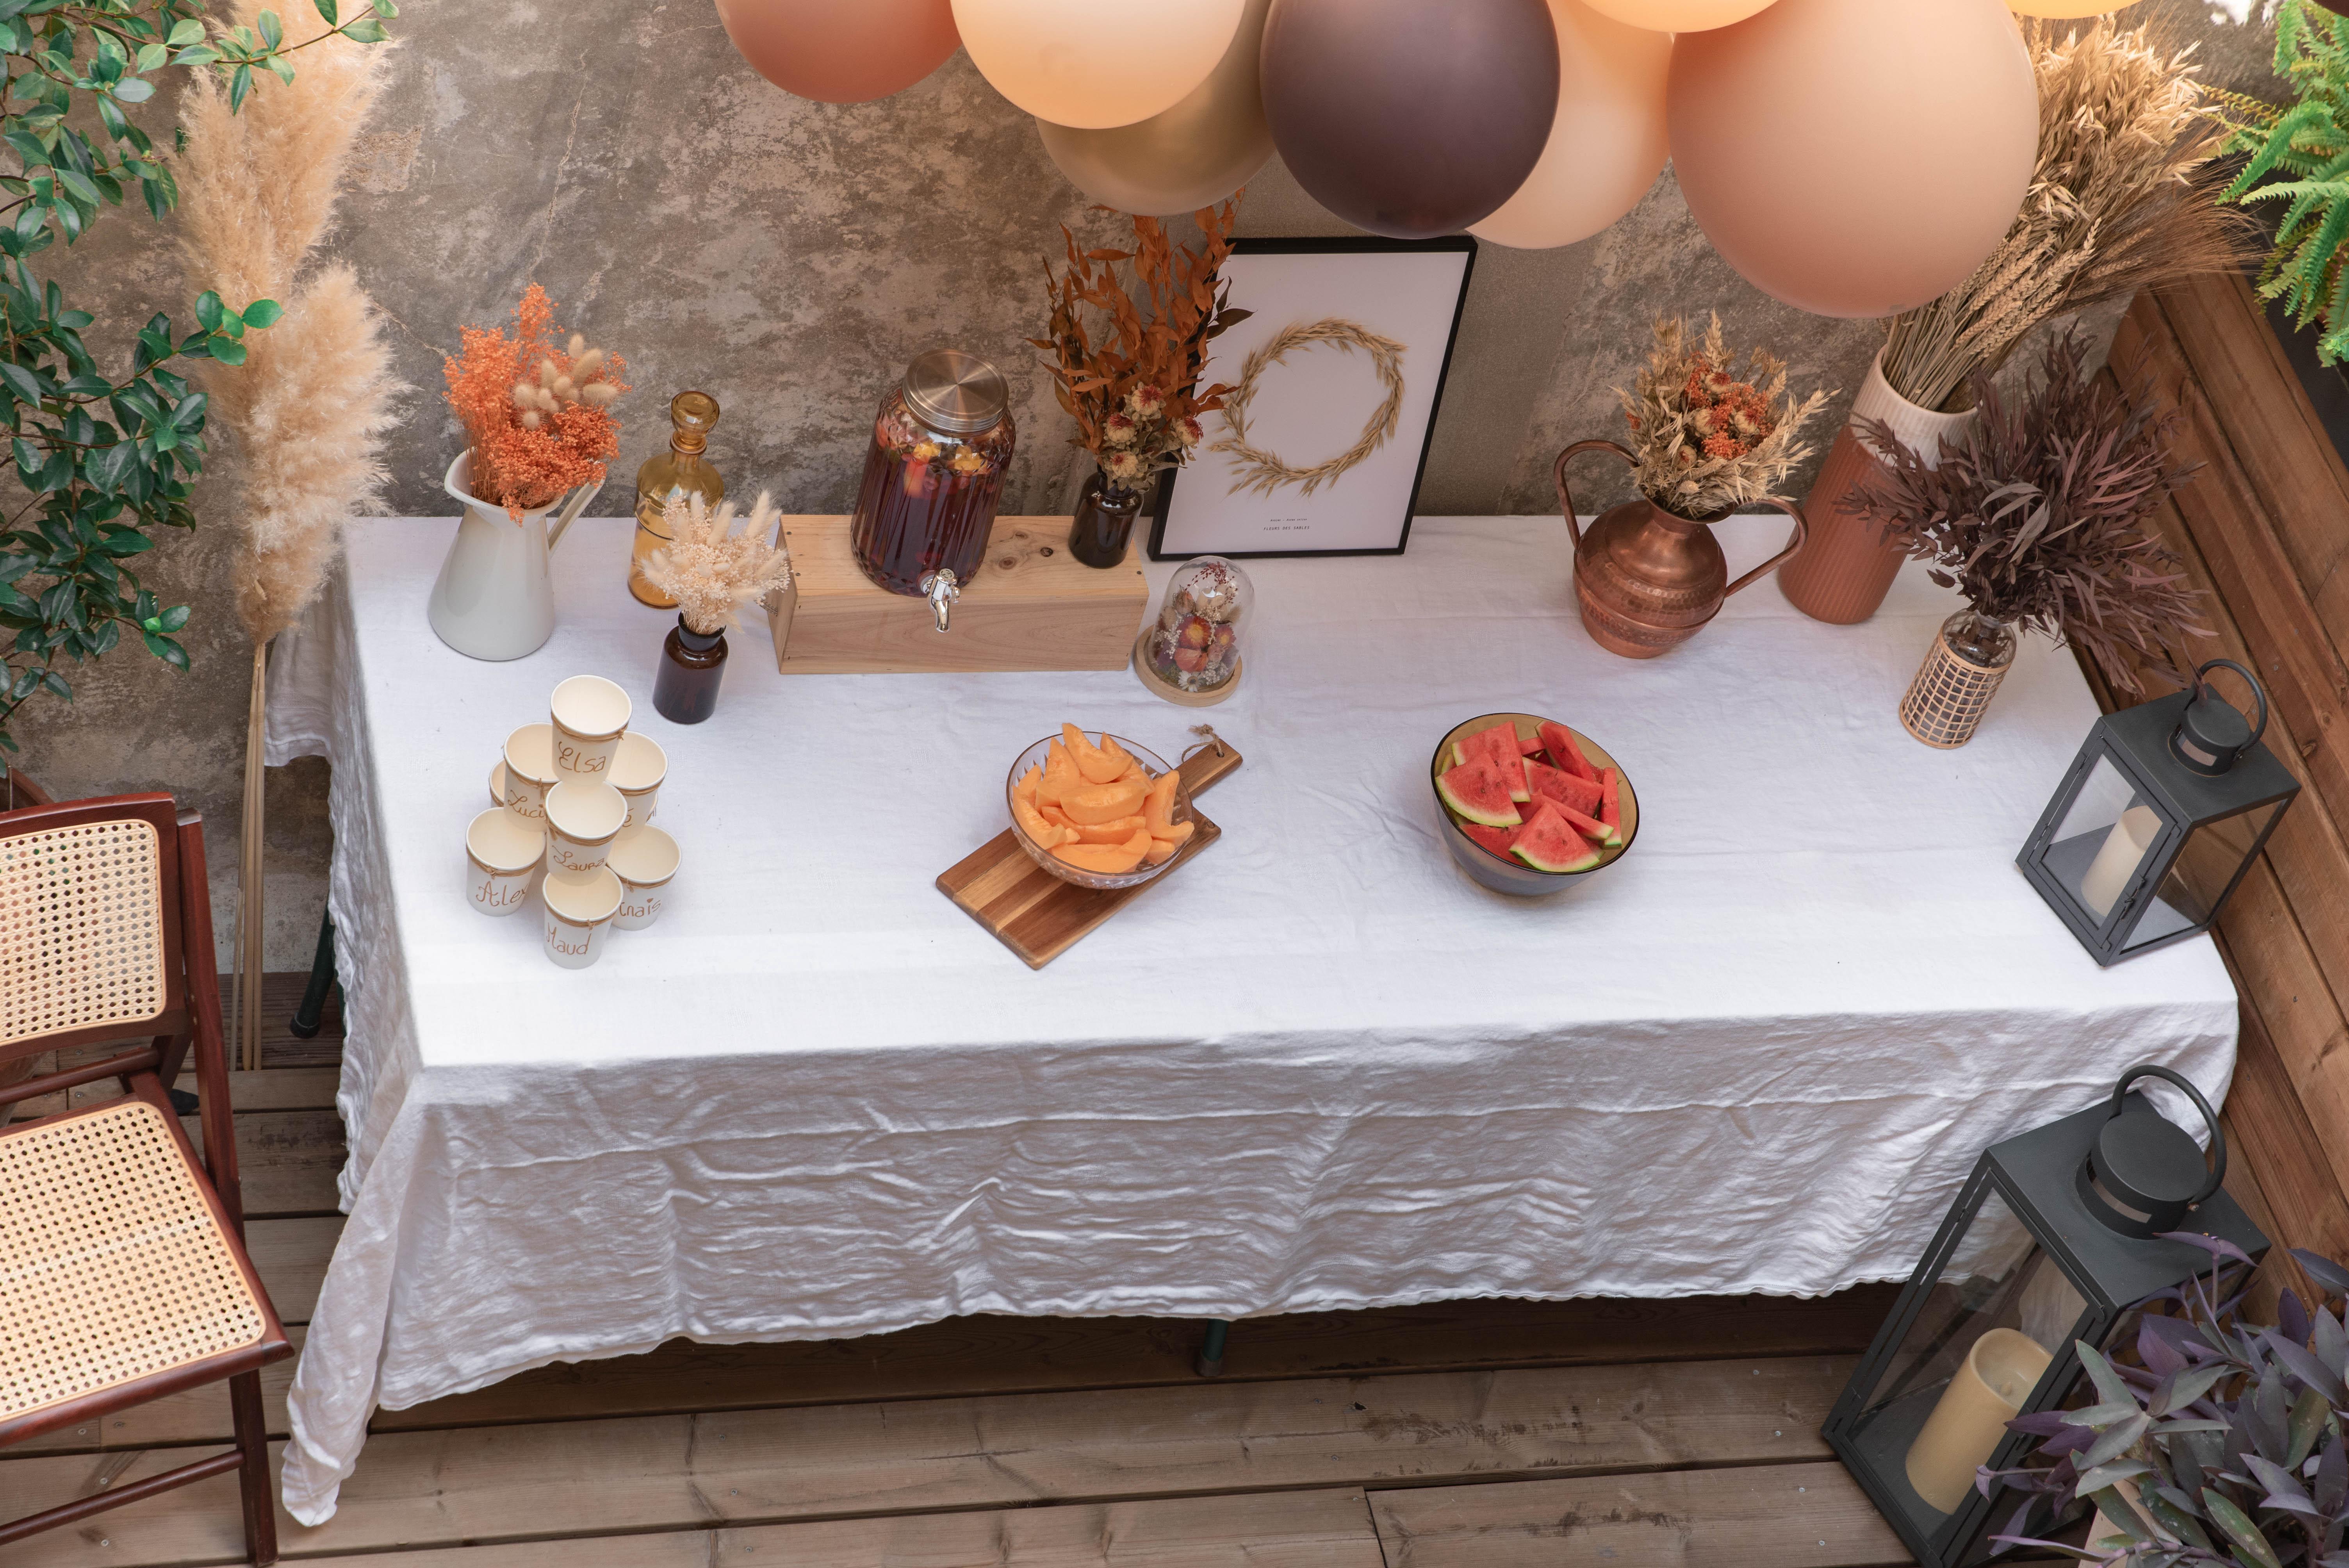 Comment-organiser-une-Baby-Shower-fleurs-sechees-decoration-1-mademoiselle-e